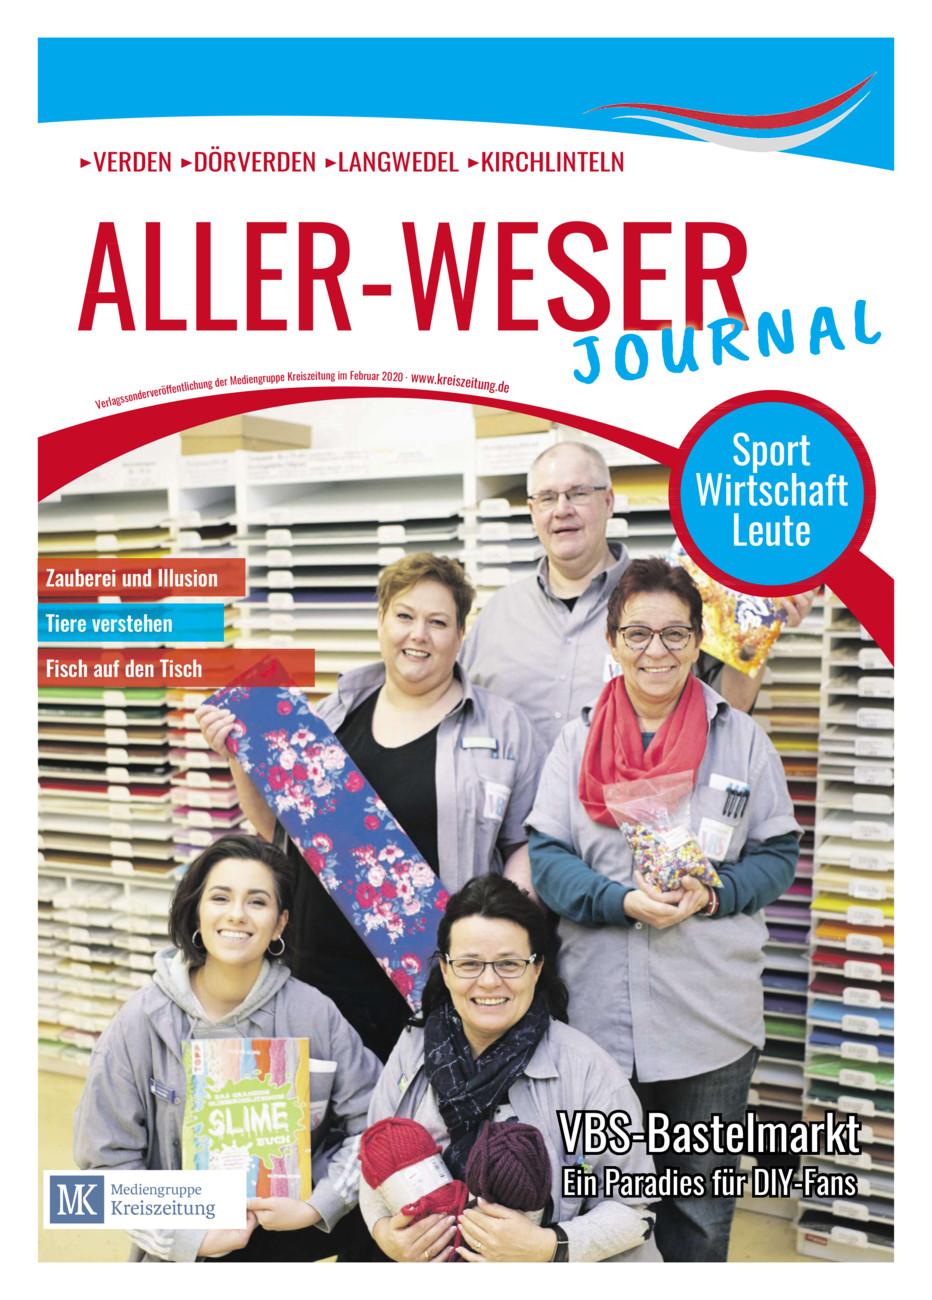 Aller Weser Journal vom Freitag, 21.02.2020